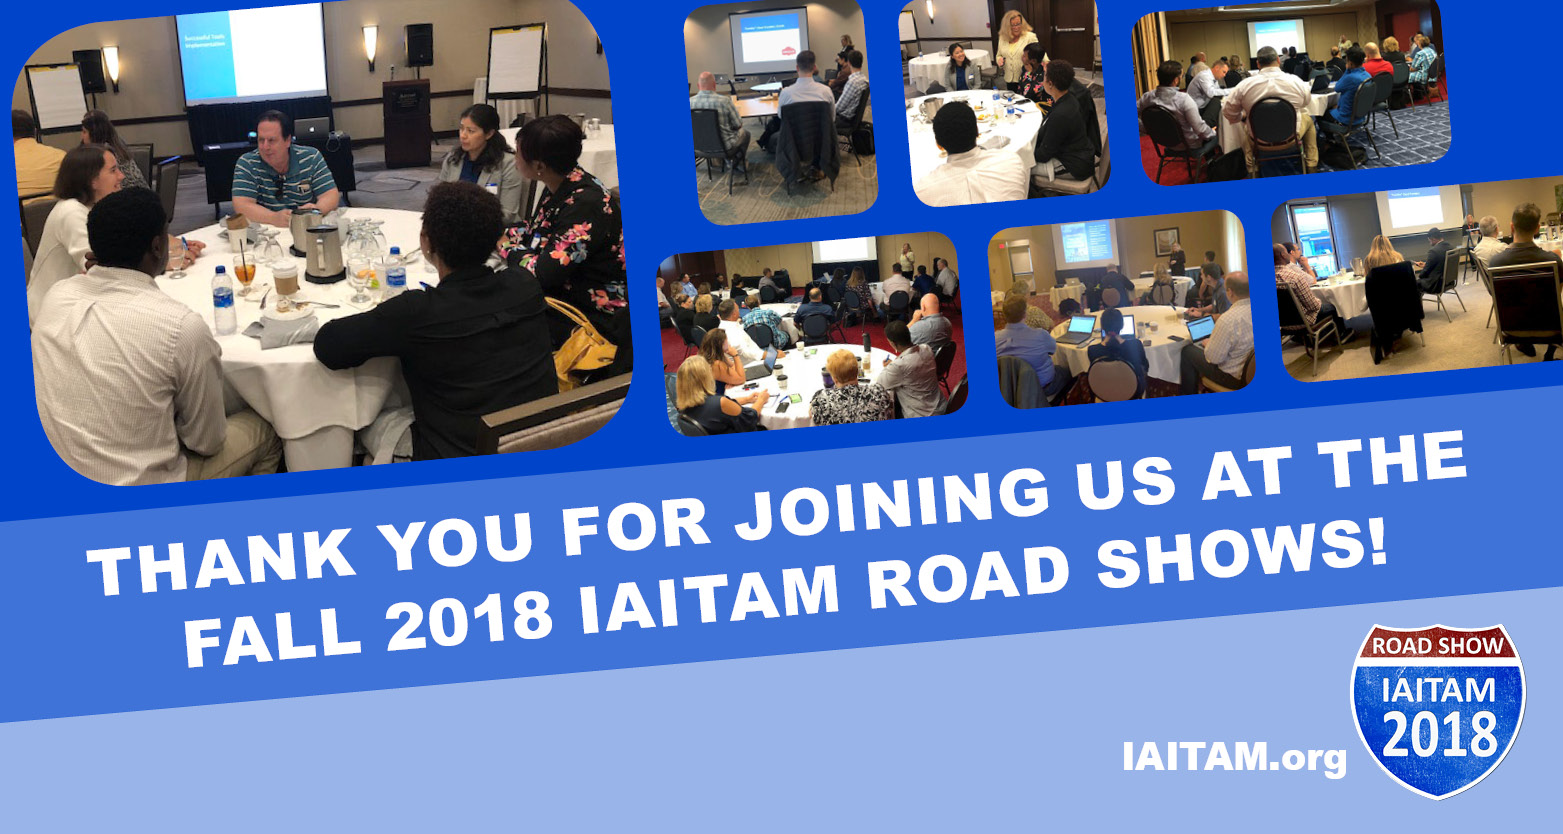 Fall 2018 IAITAM Road Shows